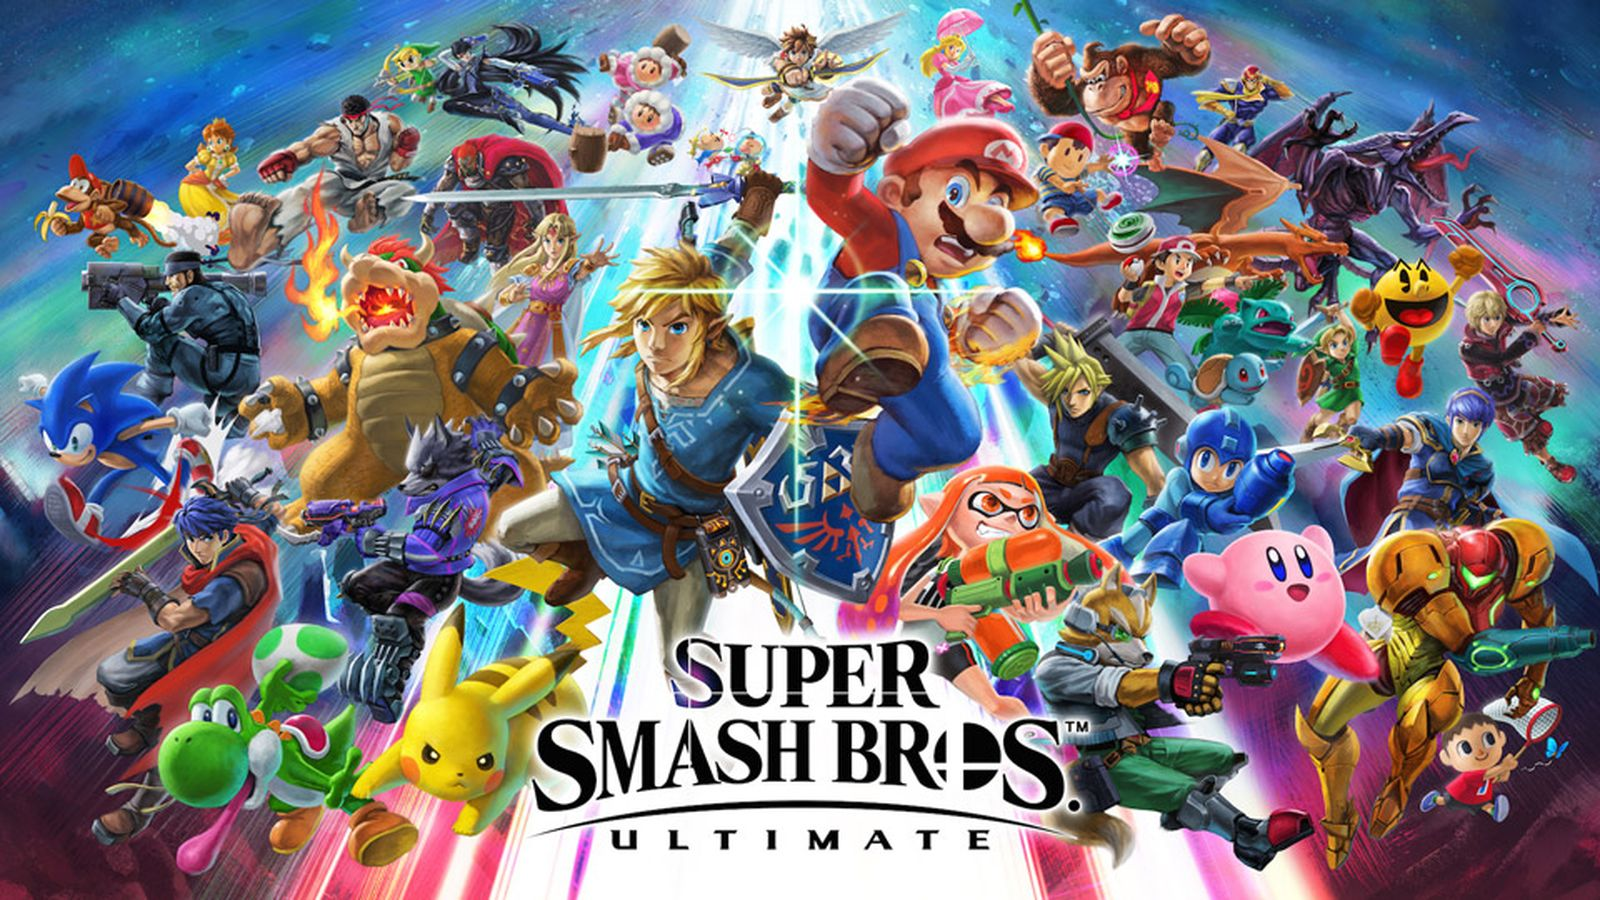 superSmashBrosUltimate illustration 00 E3 2018 Super Smash Bros. Ultimate nintendo switch